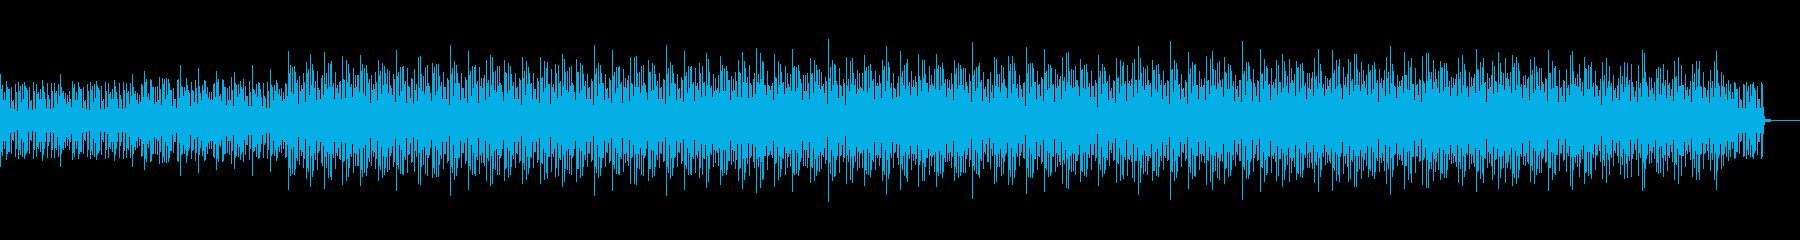 Flowersの再生済みの波形